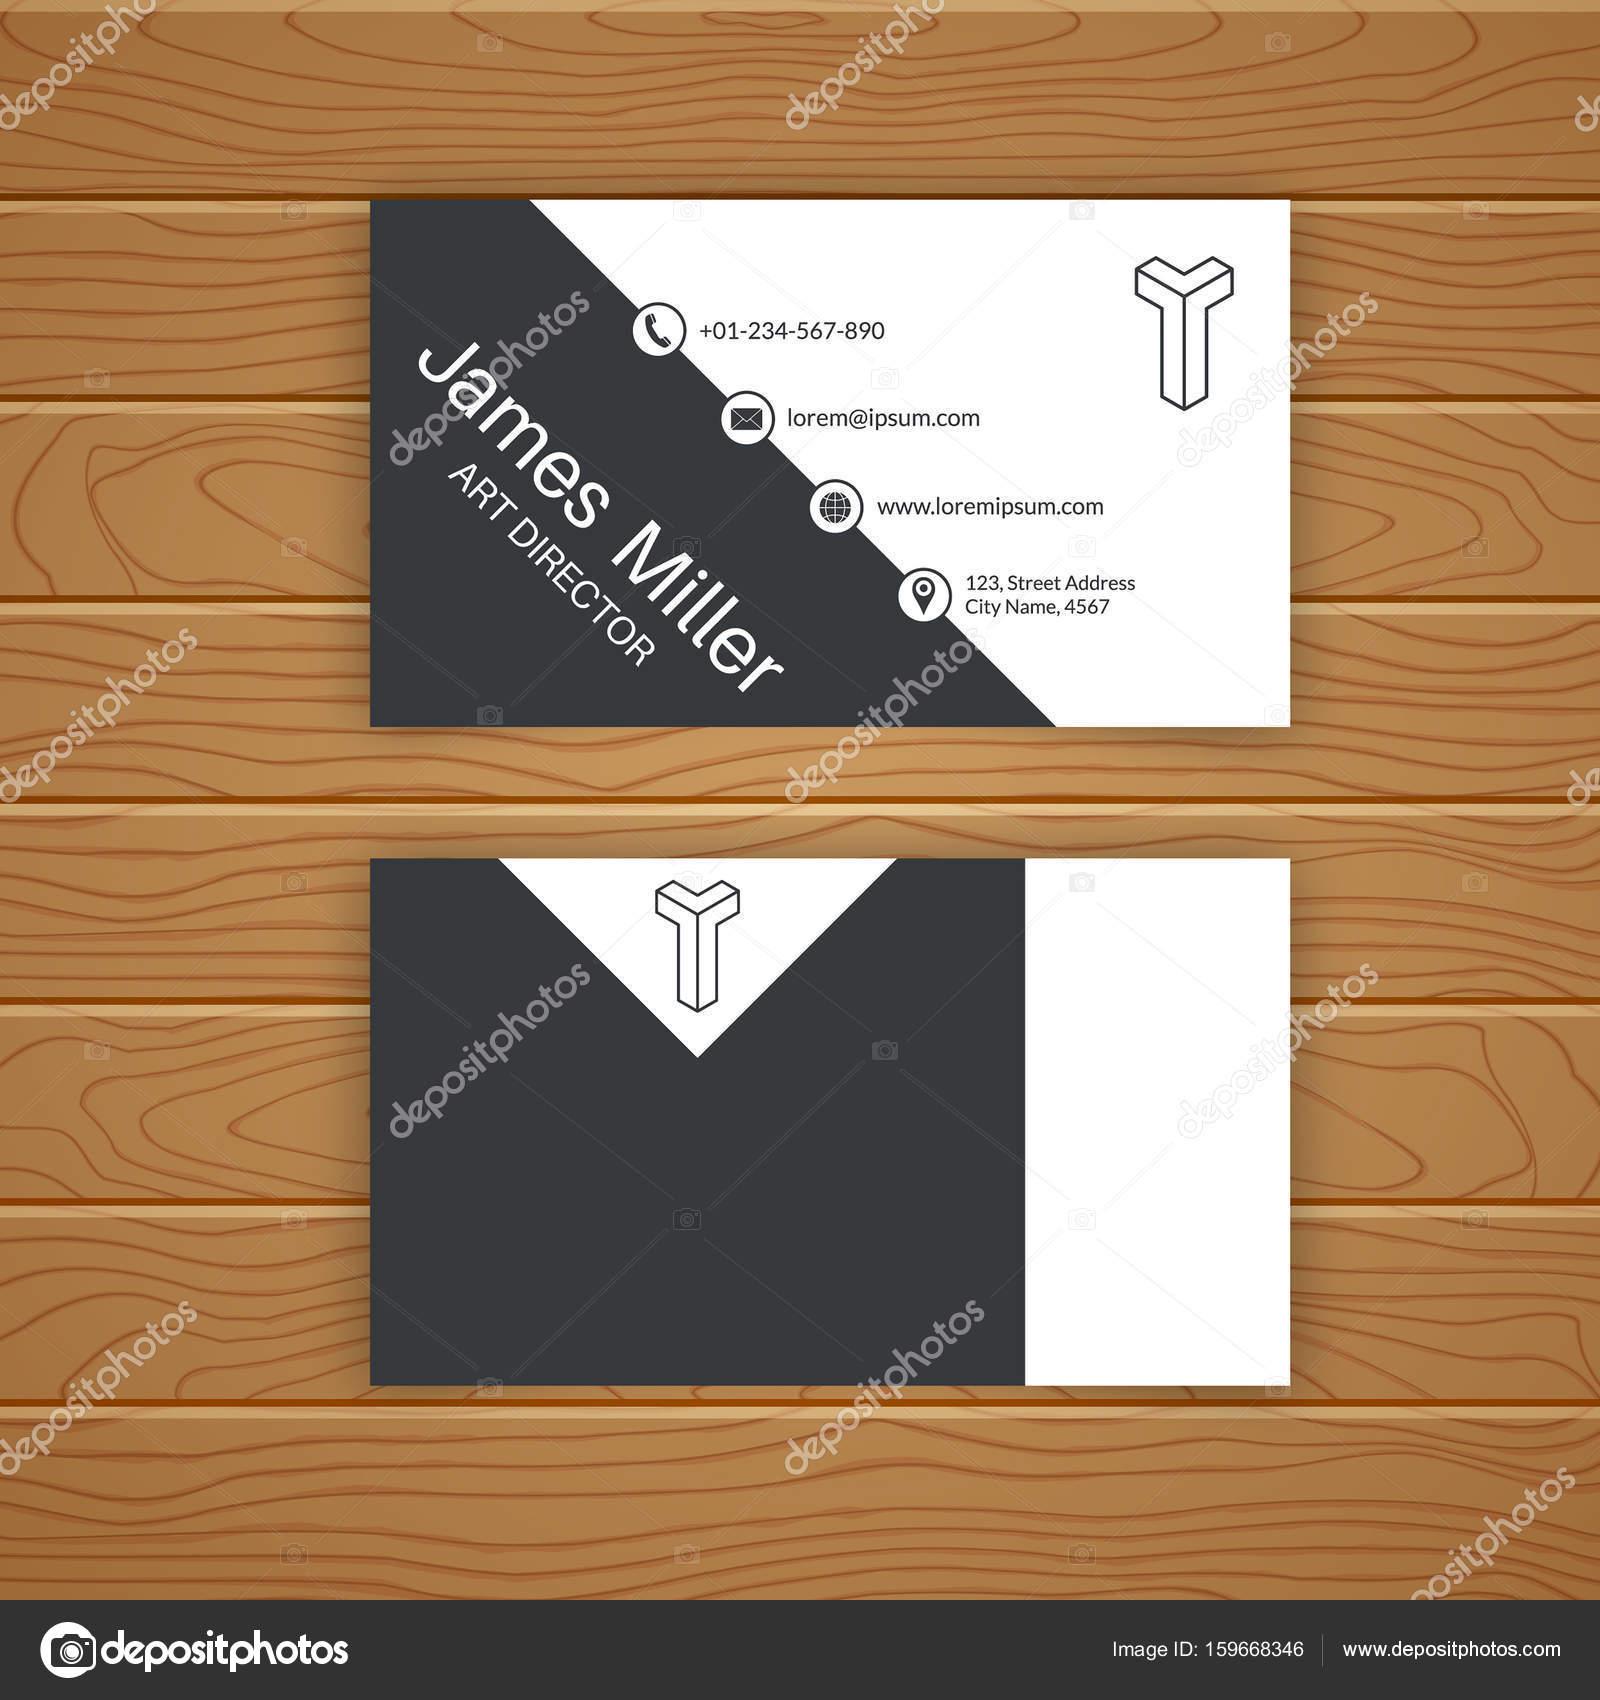 Business card blank template stock vector baretsky 159668346 business card blank template with textured background minimal elegant vector design vector by baretsky wajeb Choice Image